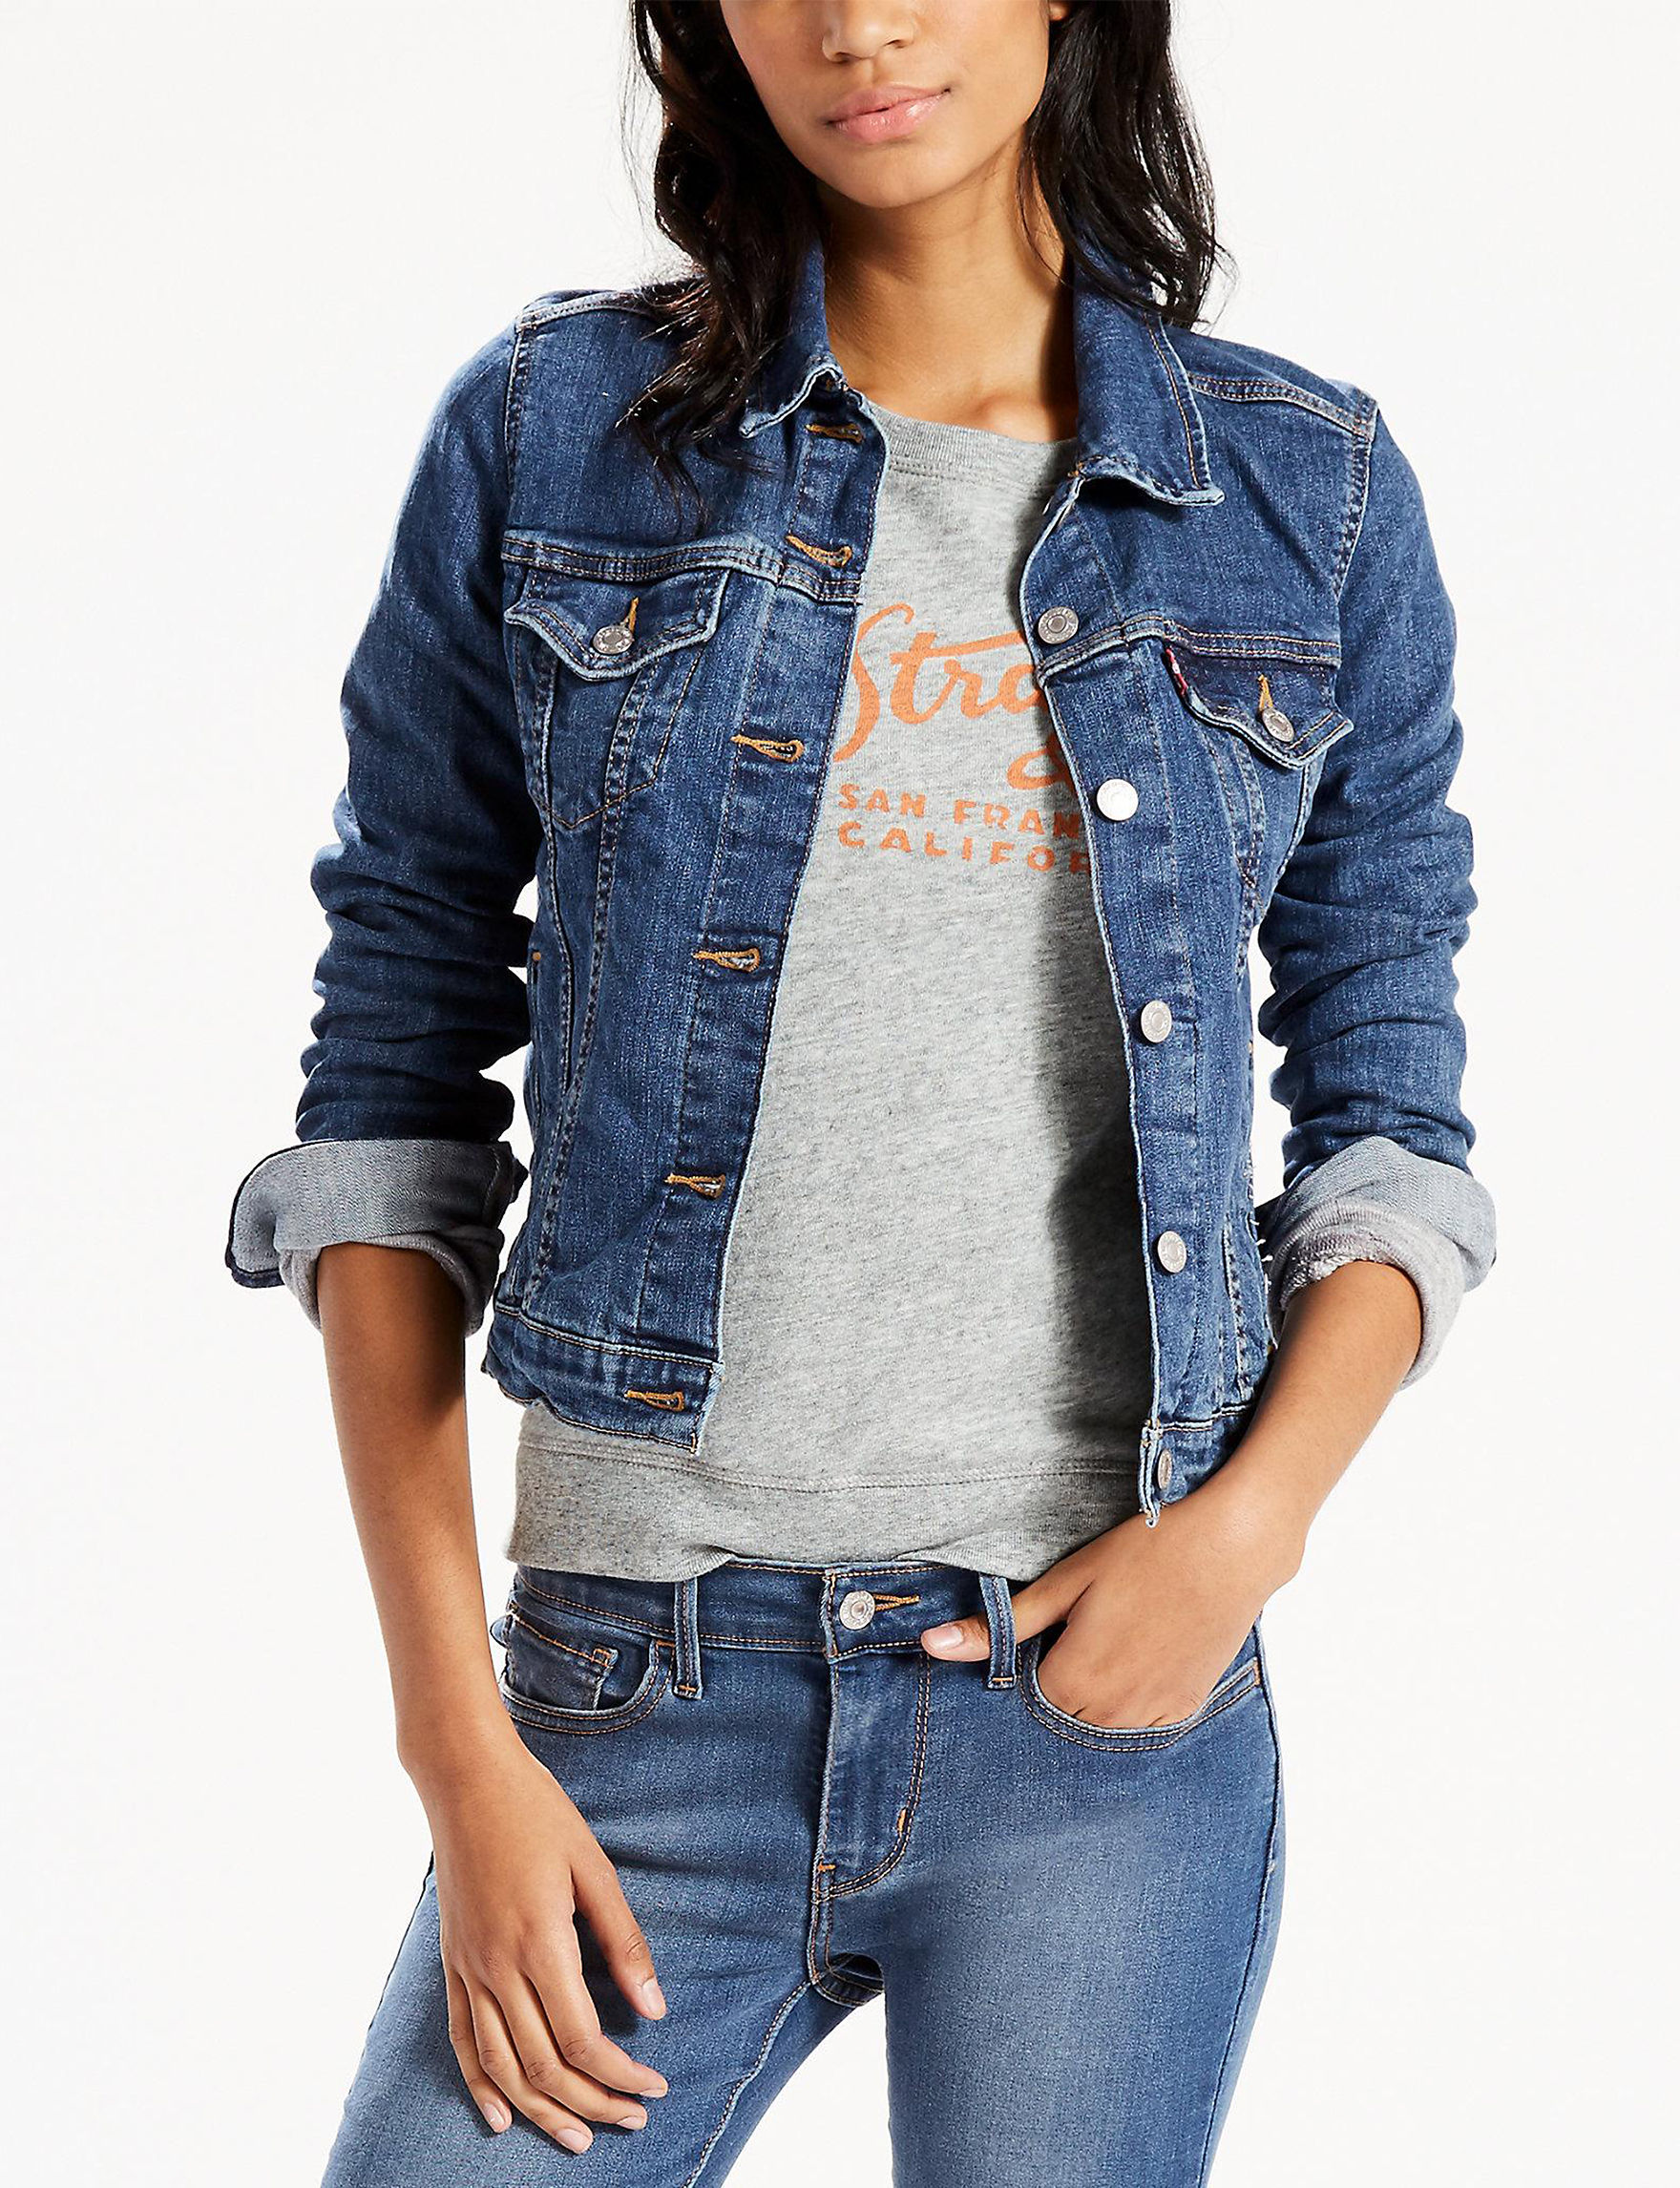 Levi's Medium Blue Denim Jackets